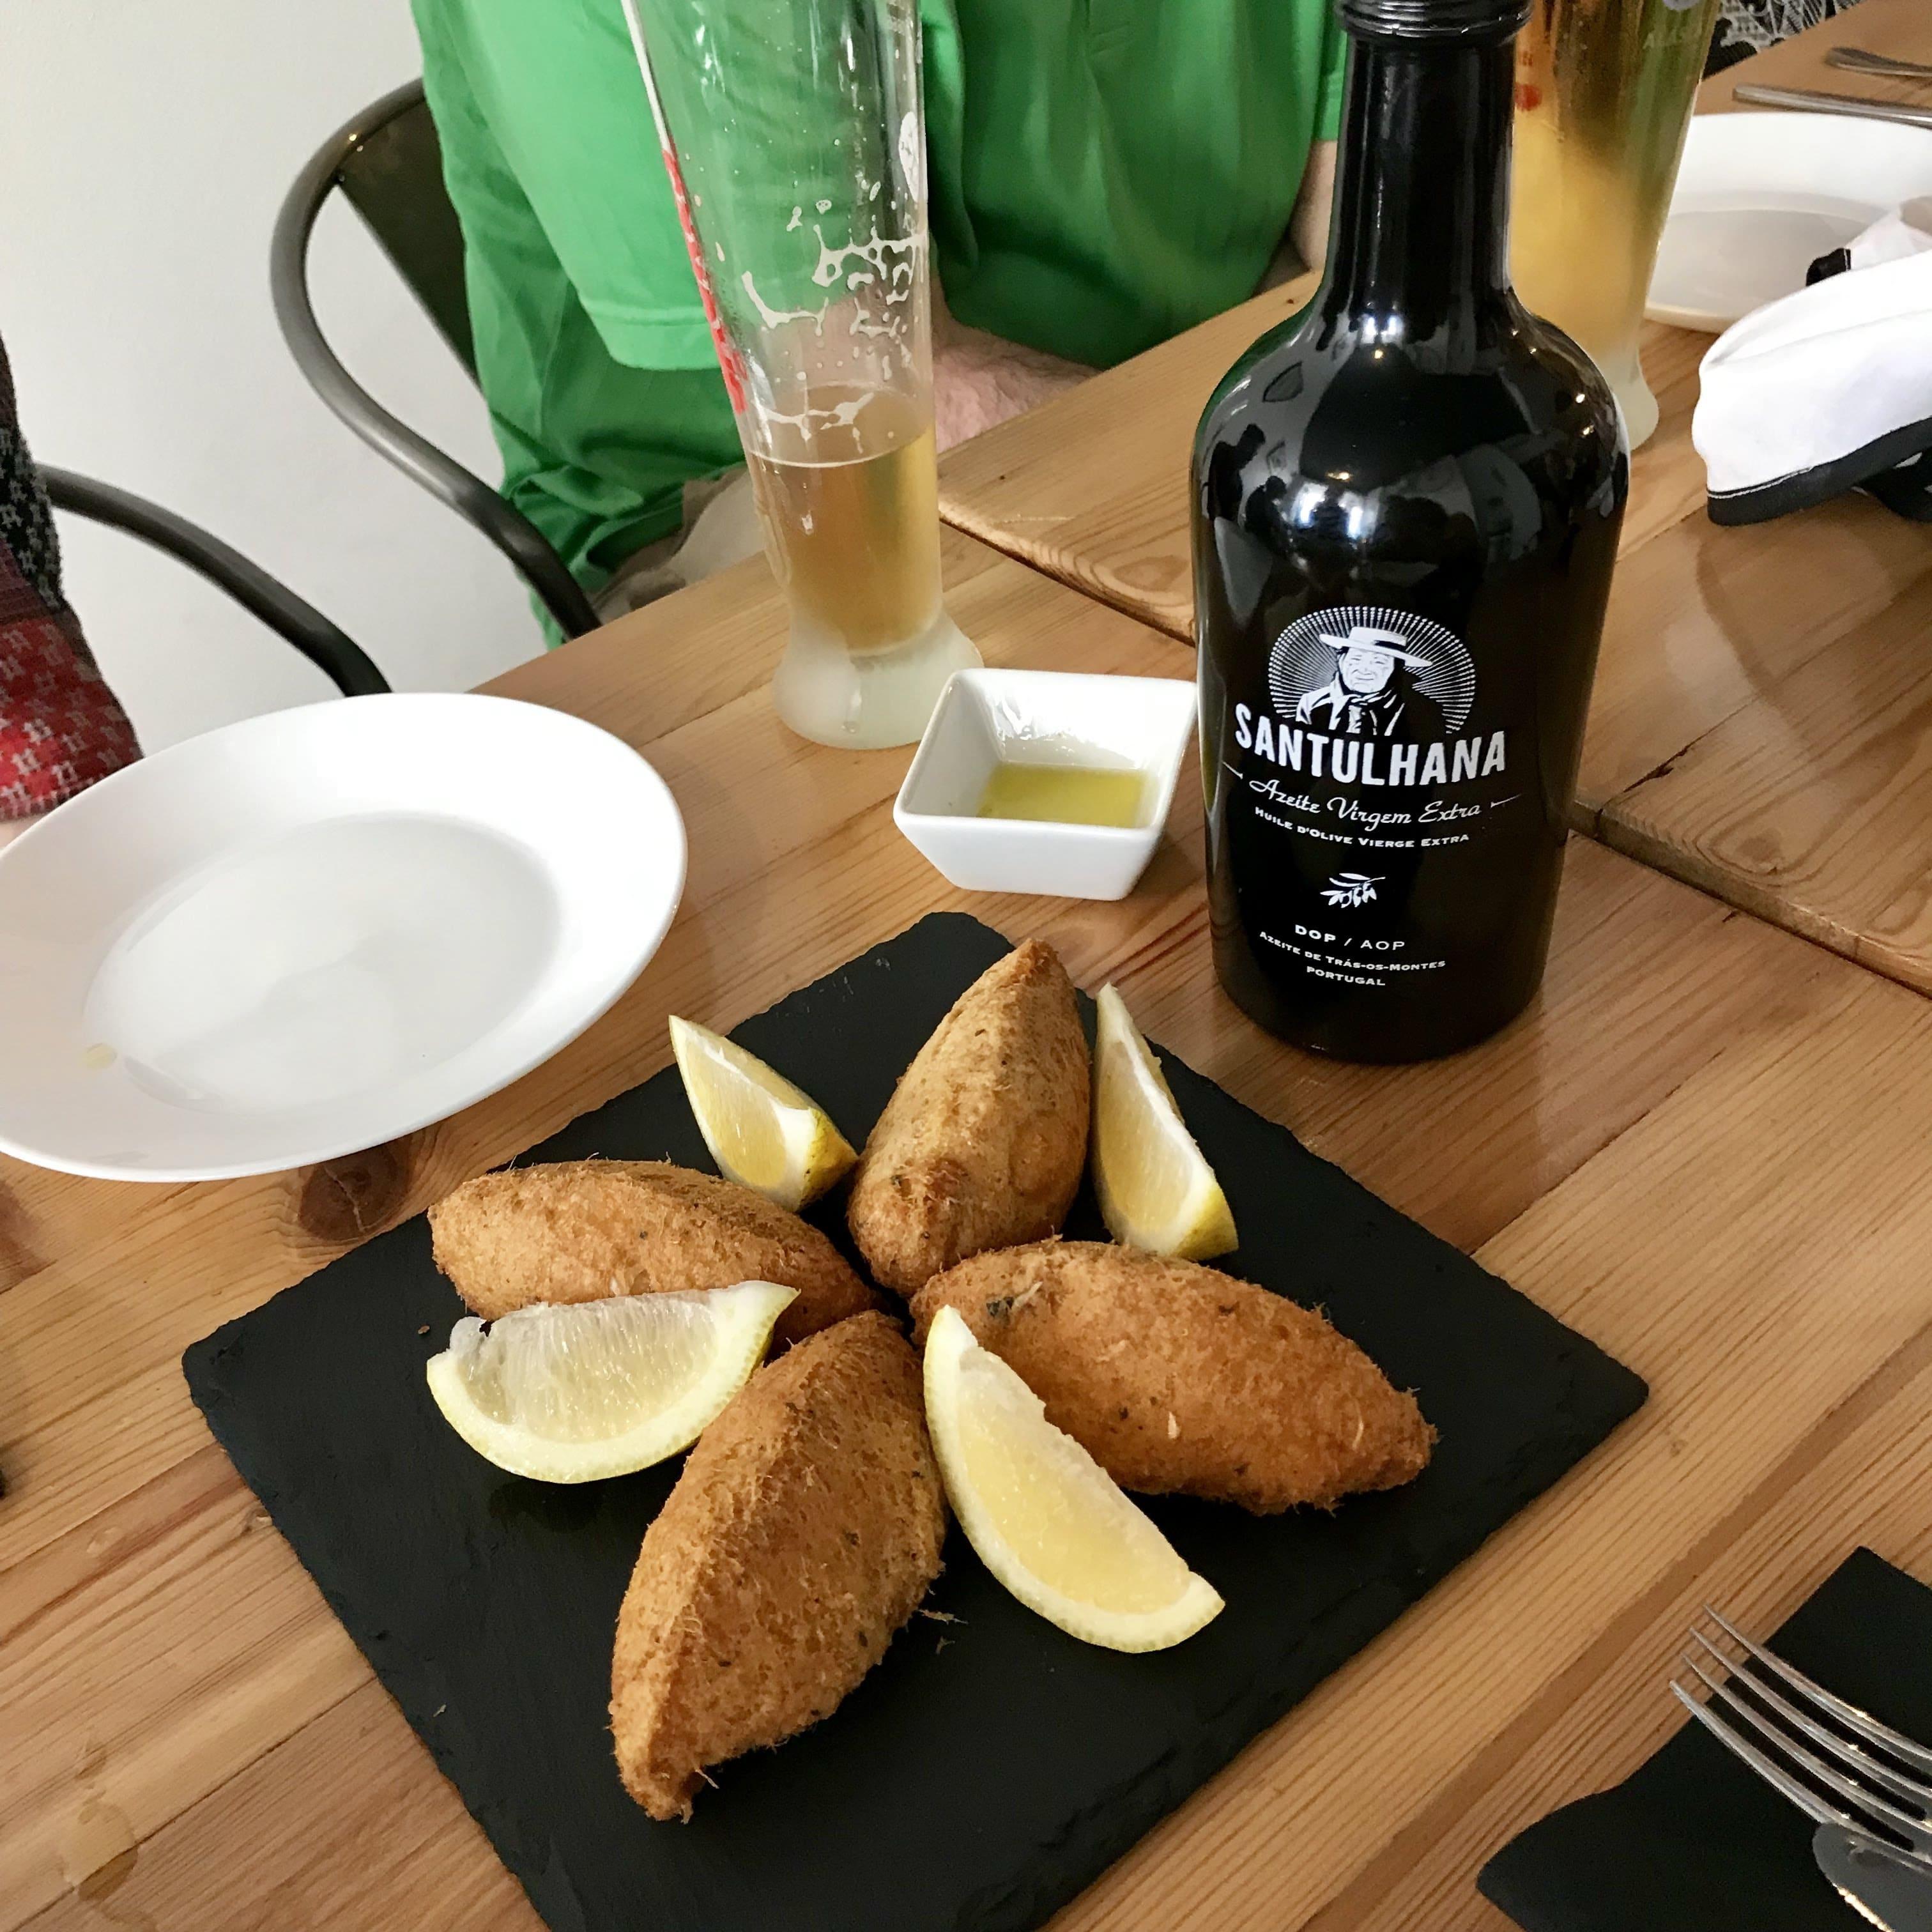 taste the best codfish cakes with treasures of lisboa in Lisbon